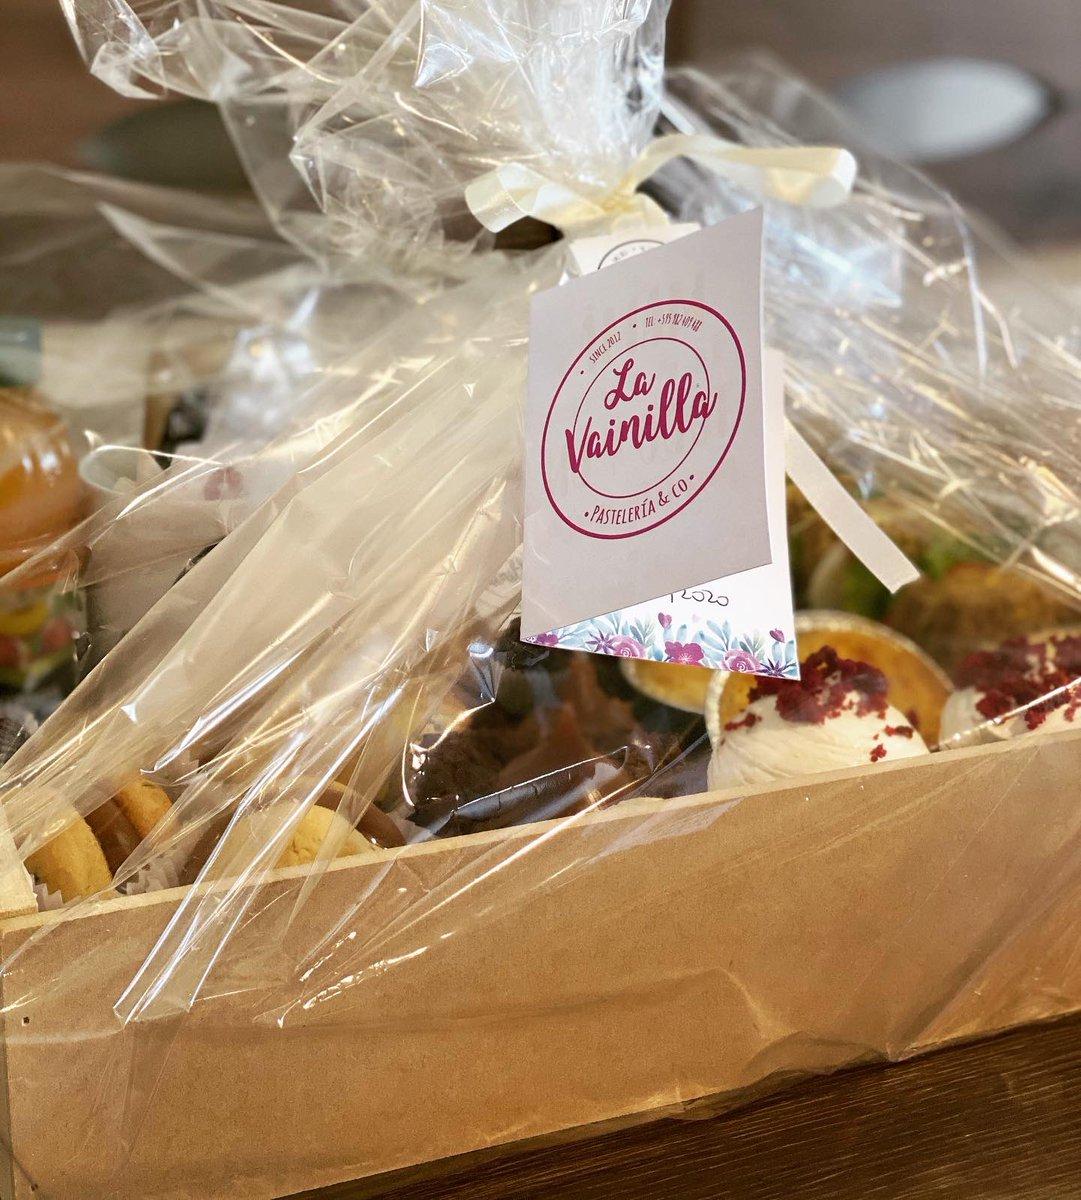 Canasta de desayuno  #freshbaked #madewithLOVE #handmade #experiencialavainilla #lavainillapy #delivery #breakfast #redvelvet #brownie #dulcedeleche #brigadeiro #cookie #alfajoresdemaicena  0982-409-488 pic.twitter.com/mV91dfleIt